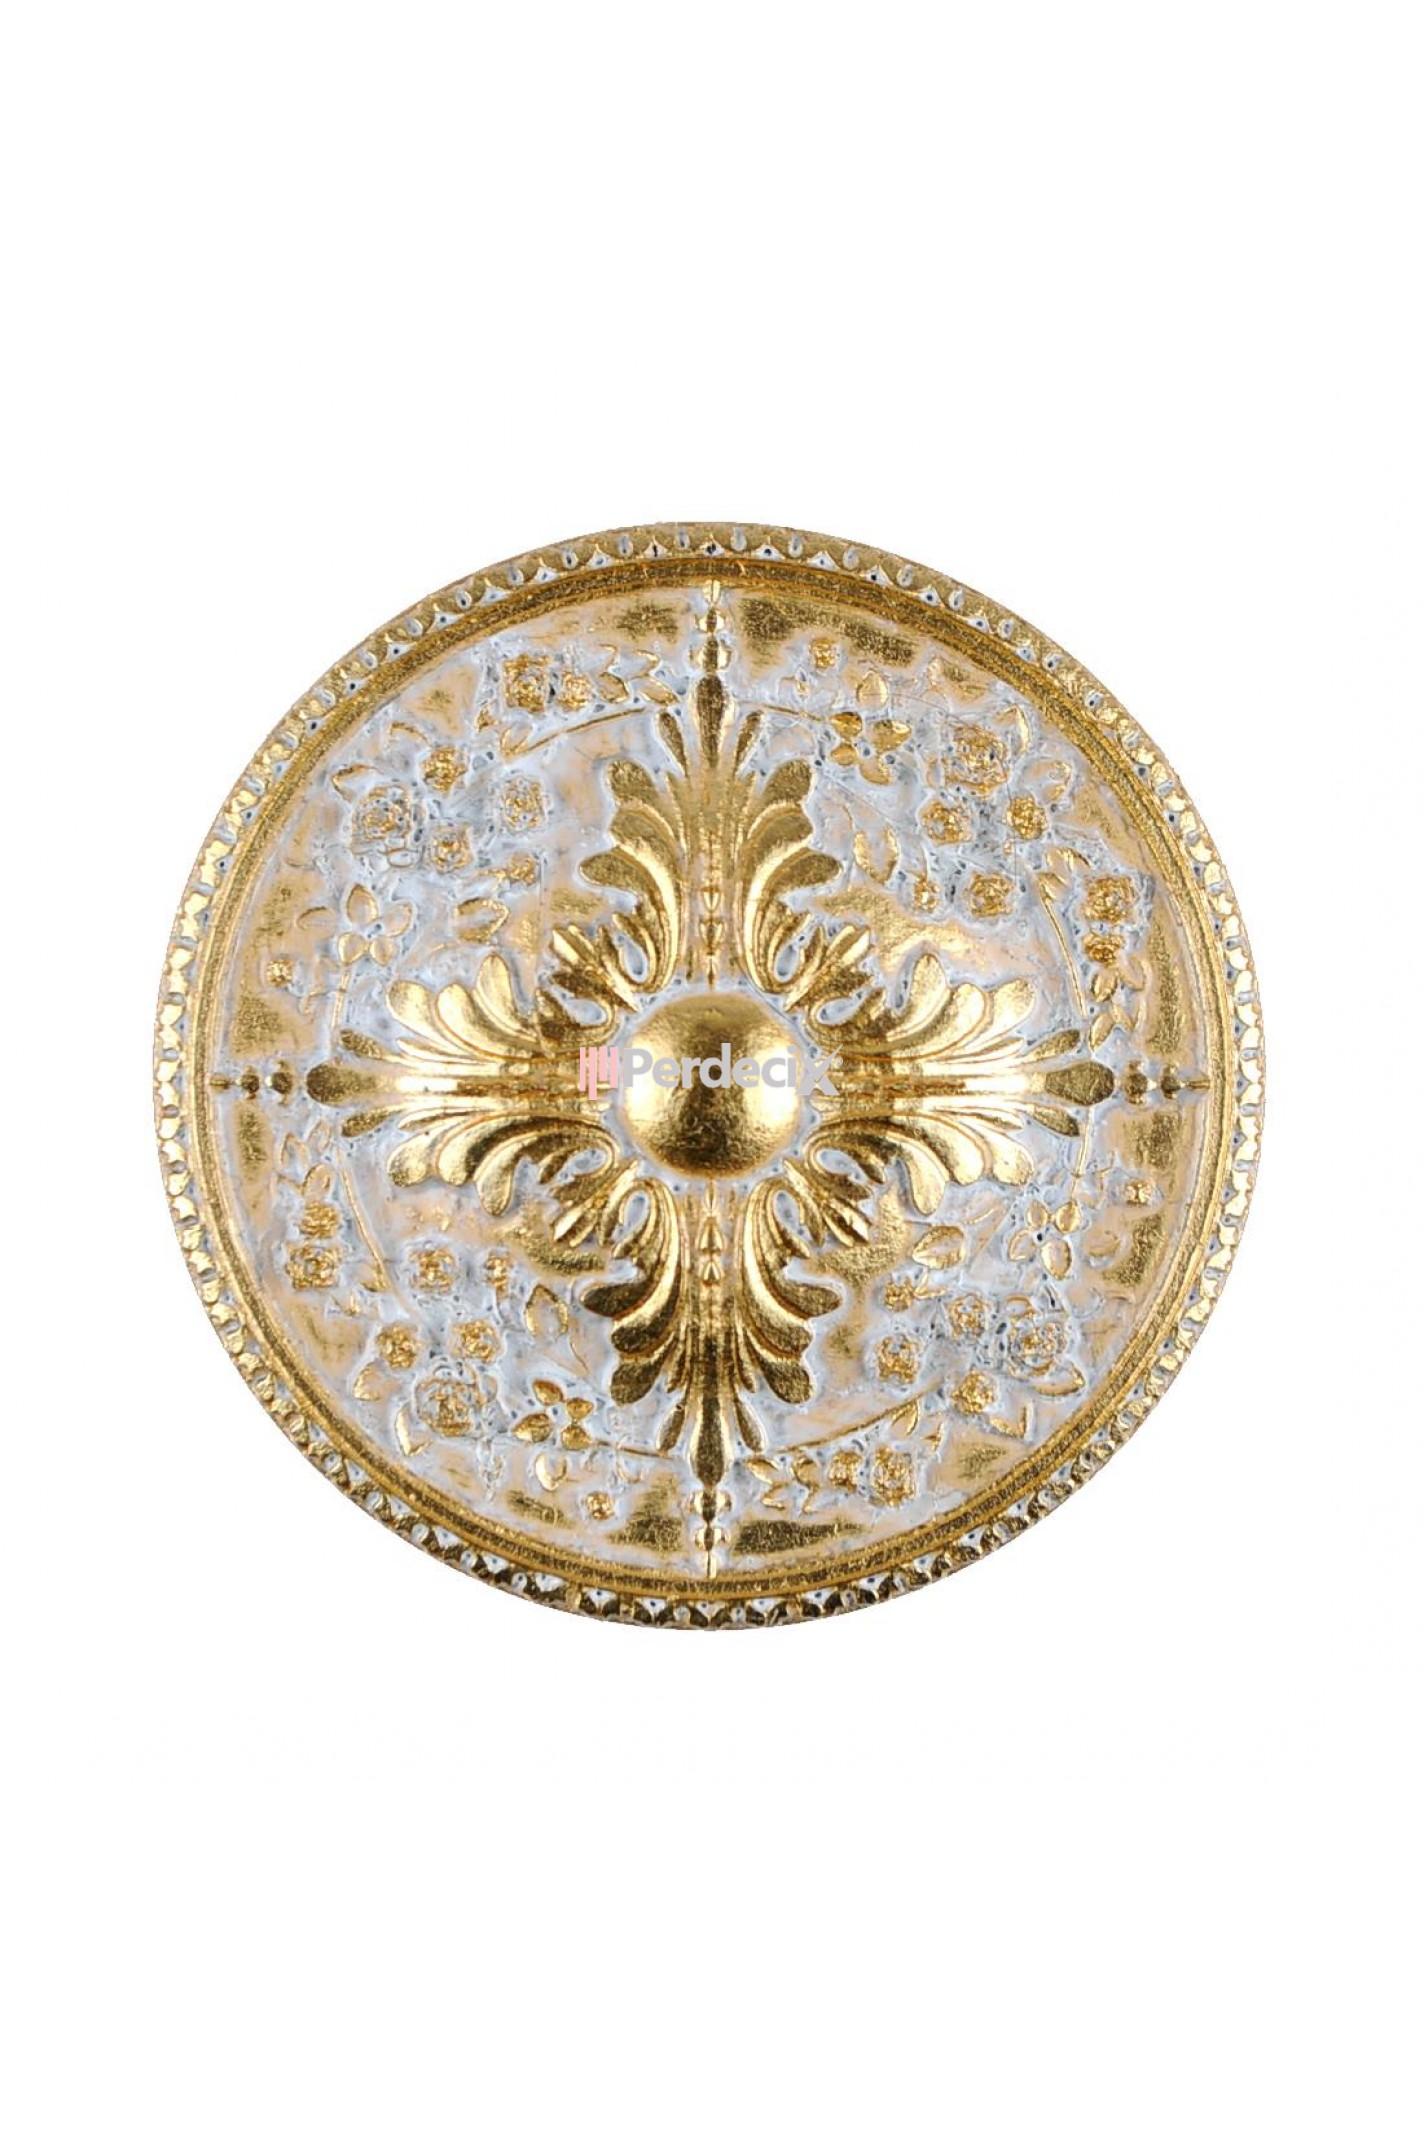 Metal Renso Fon Bağlama Demiri - Altın/Beyaz